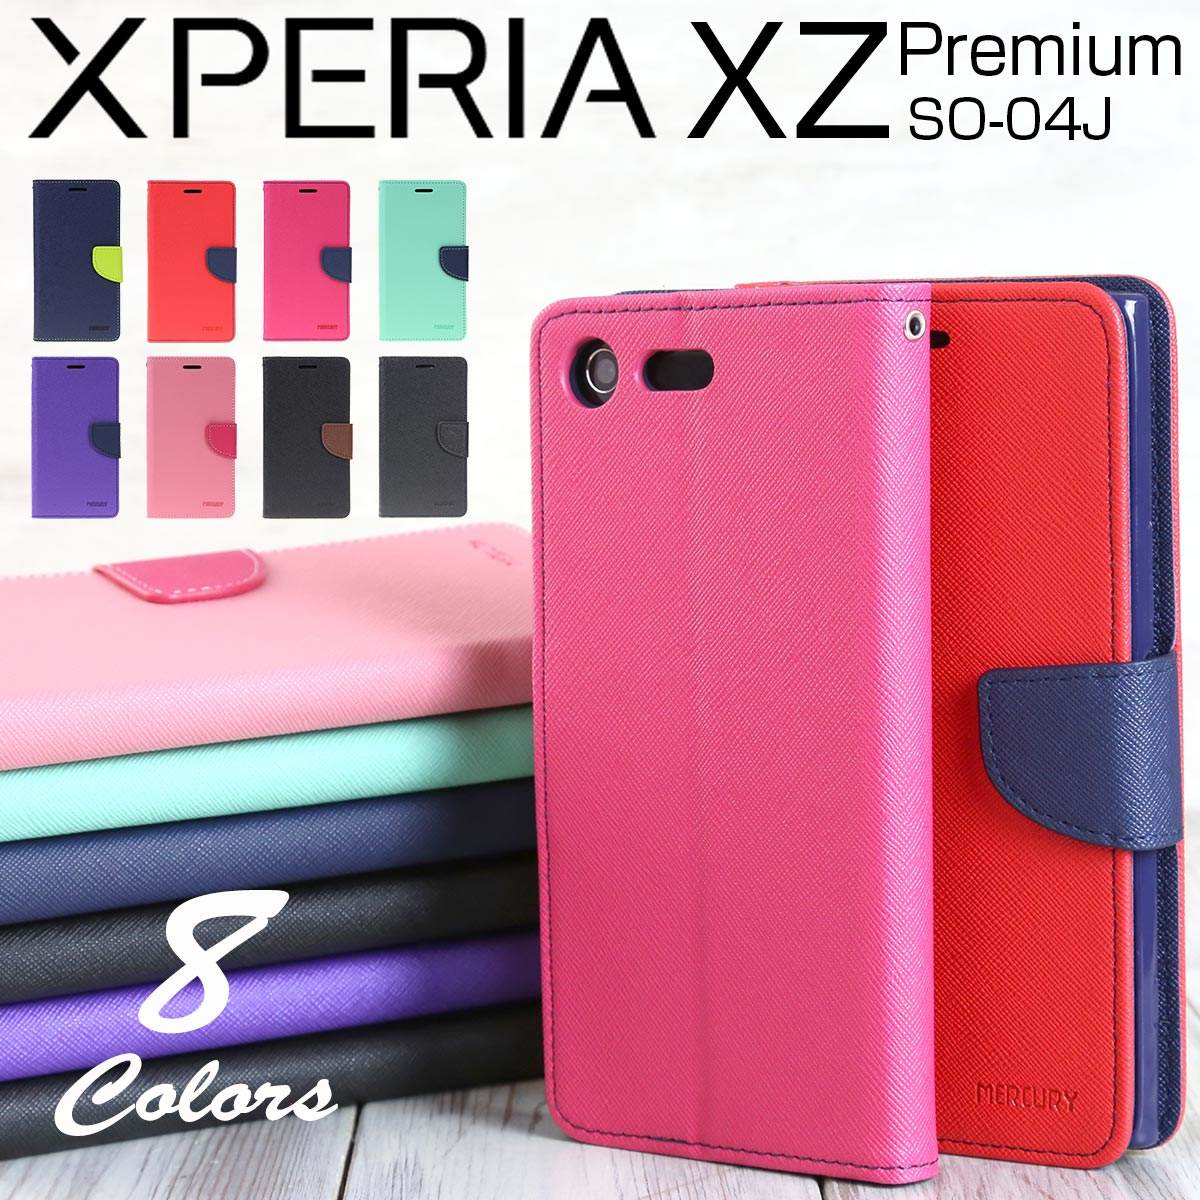 af22dd3bc4 XPERIA XZ Premium SO-04J エクスペリア プレミアム so04j ケース カバー 手帳型ケース スマホケース スマホカバー  携帯ケース 携帯カバー スマートフォンケース ...